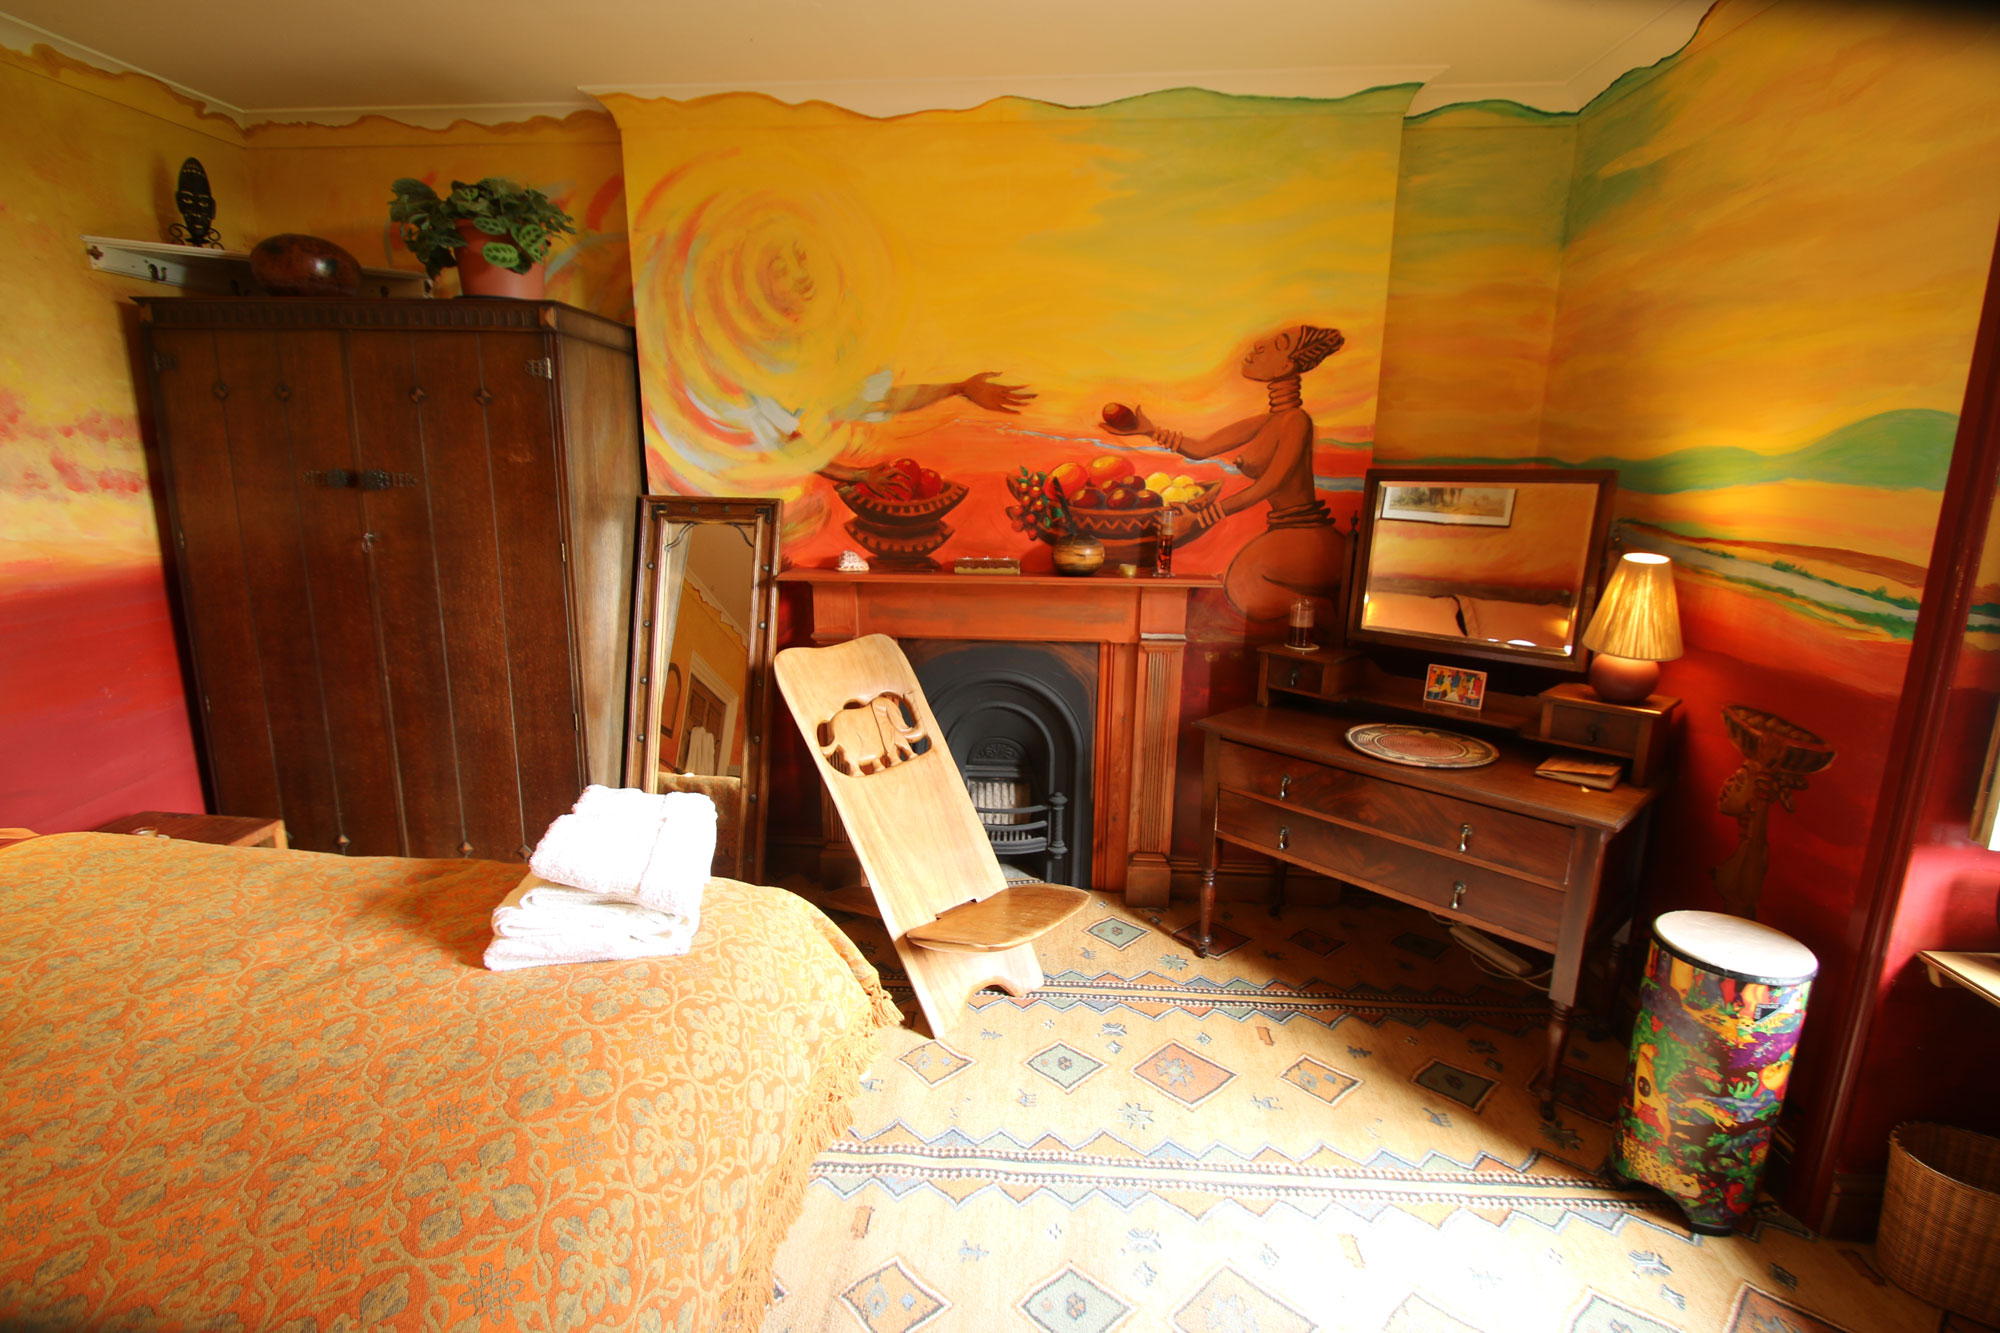 Oya double room at Over the Rainbow